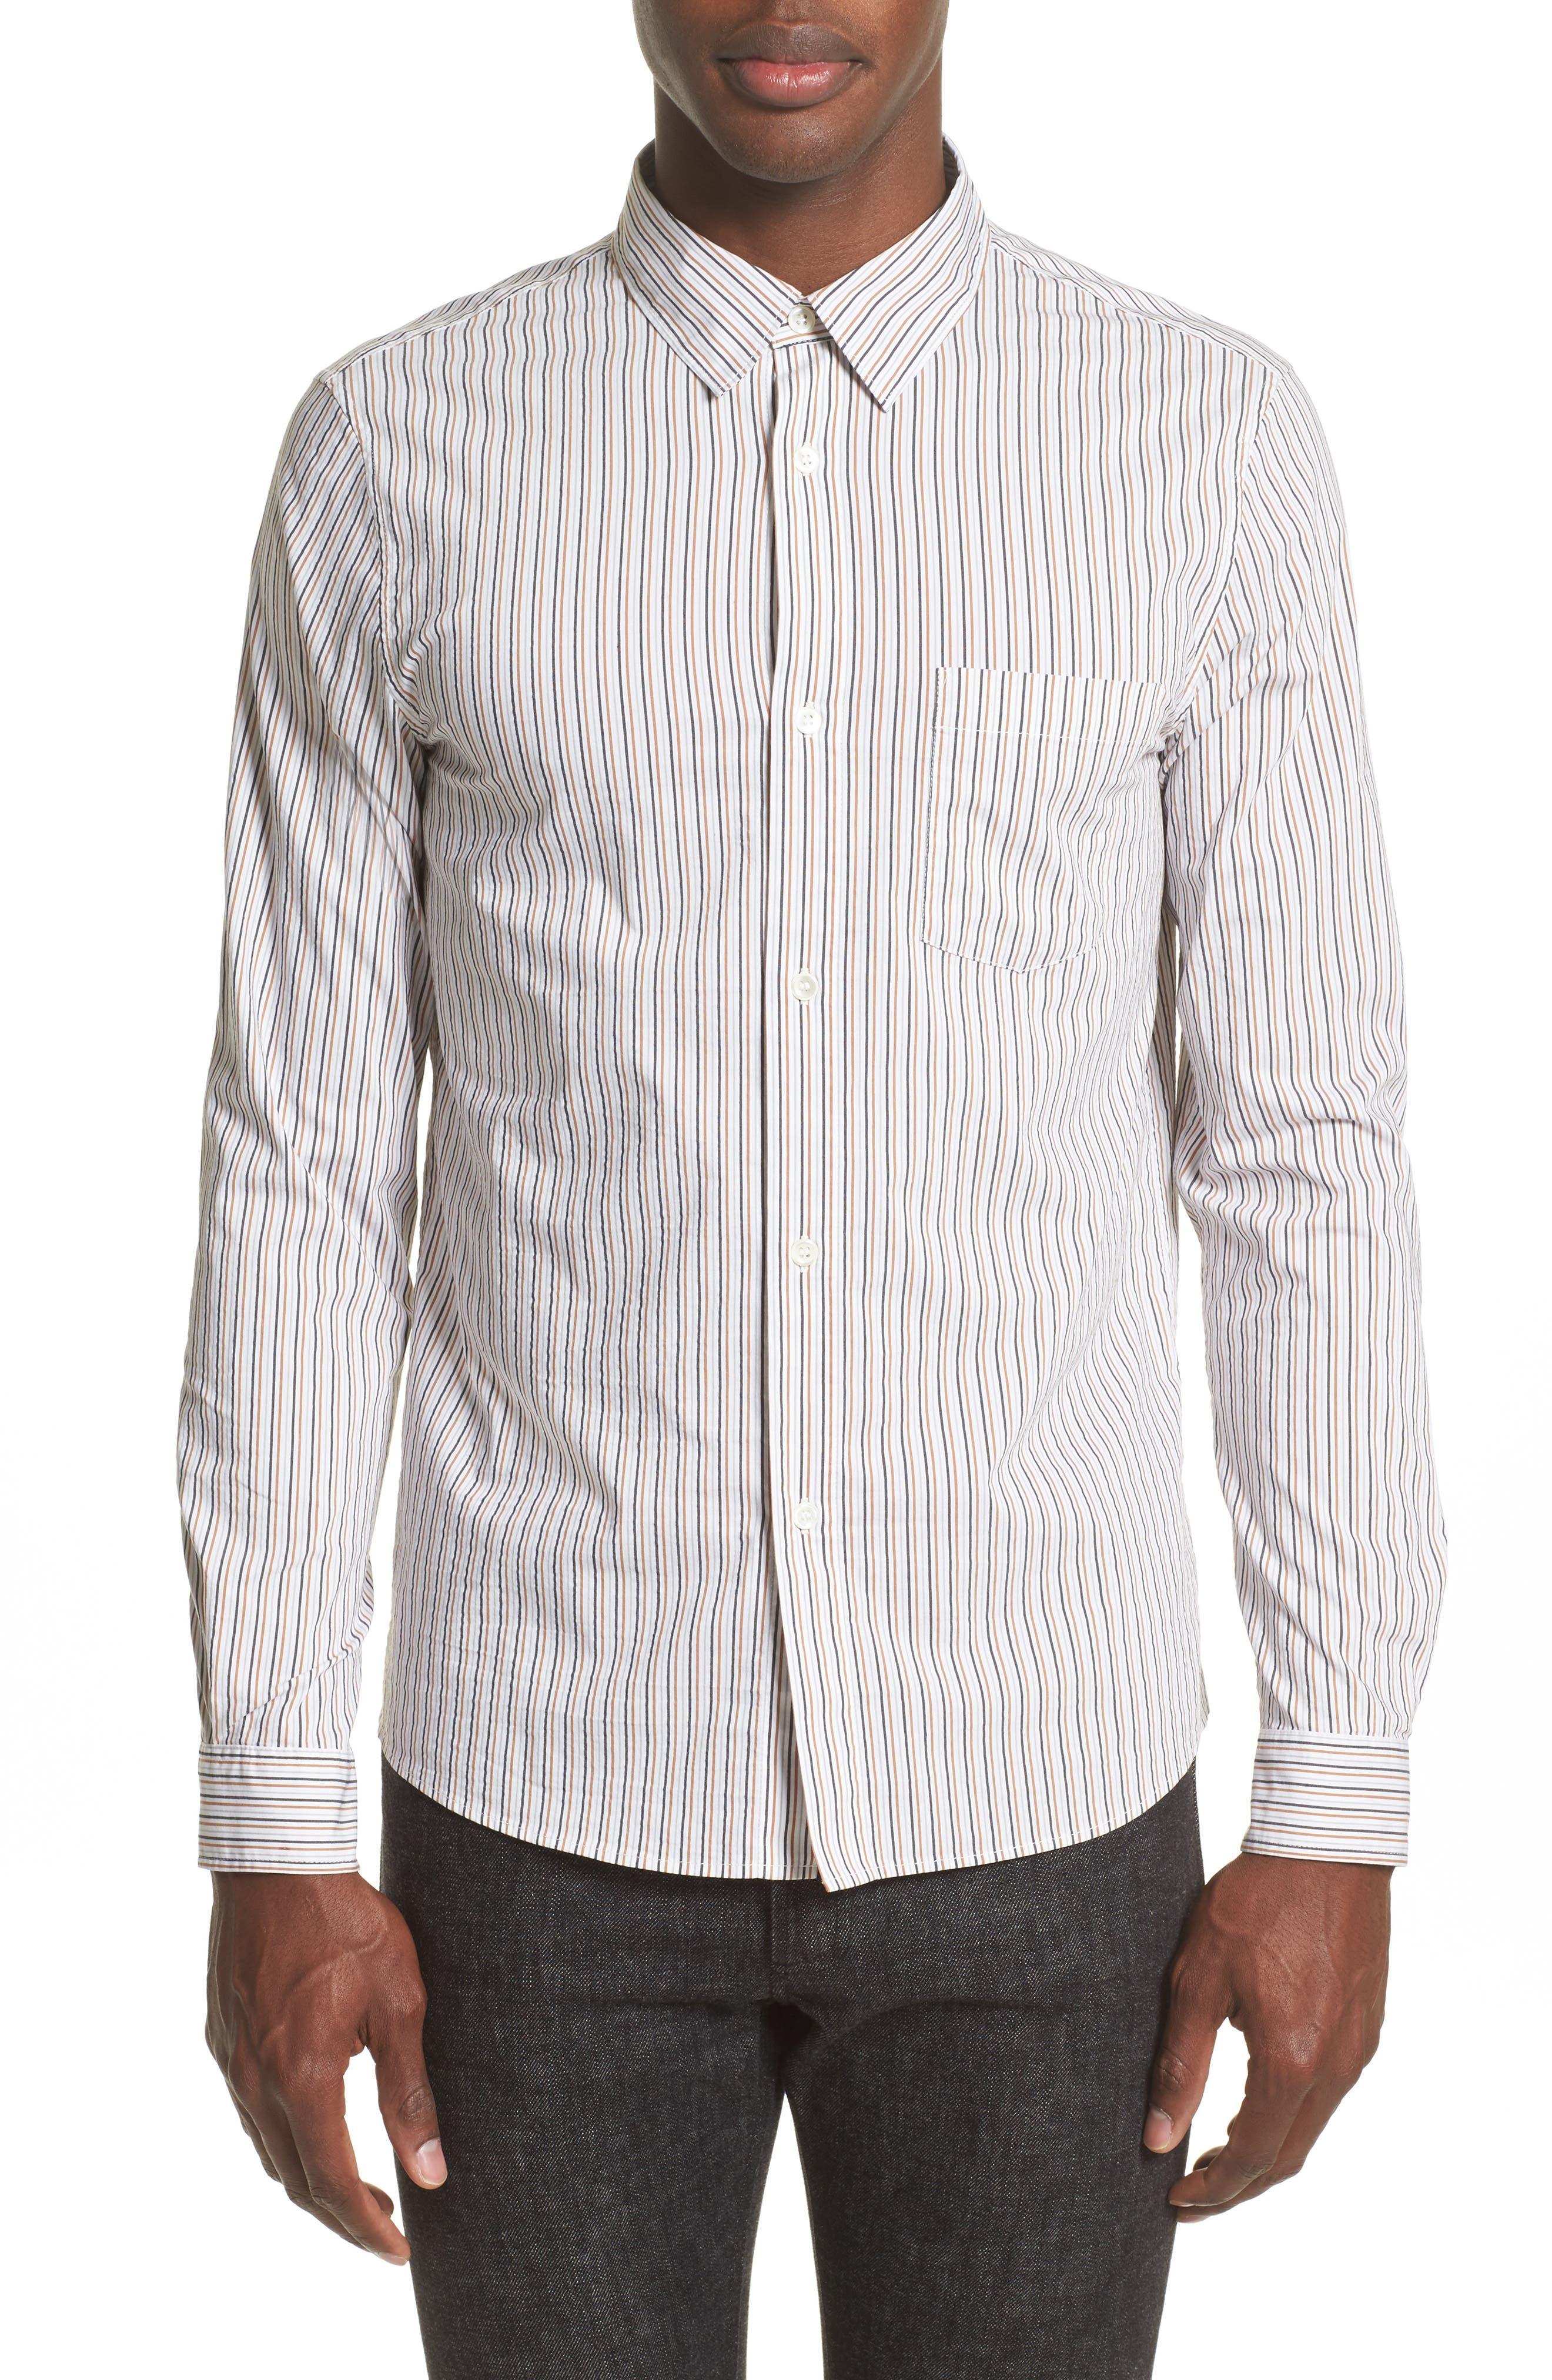 Franklin Extra Trim Fit Stripe Sport Shirt,                             Main thumbnail 1, color,                             100